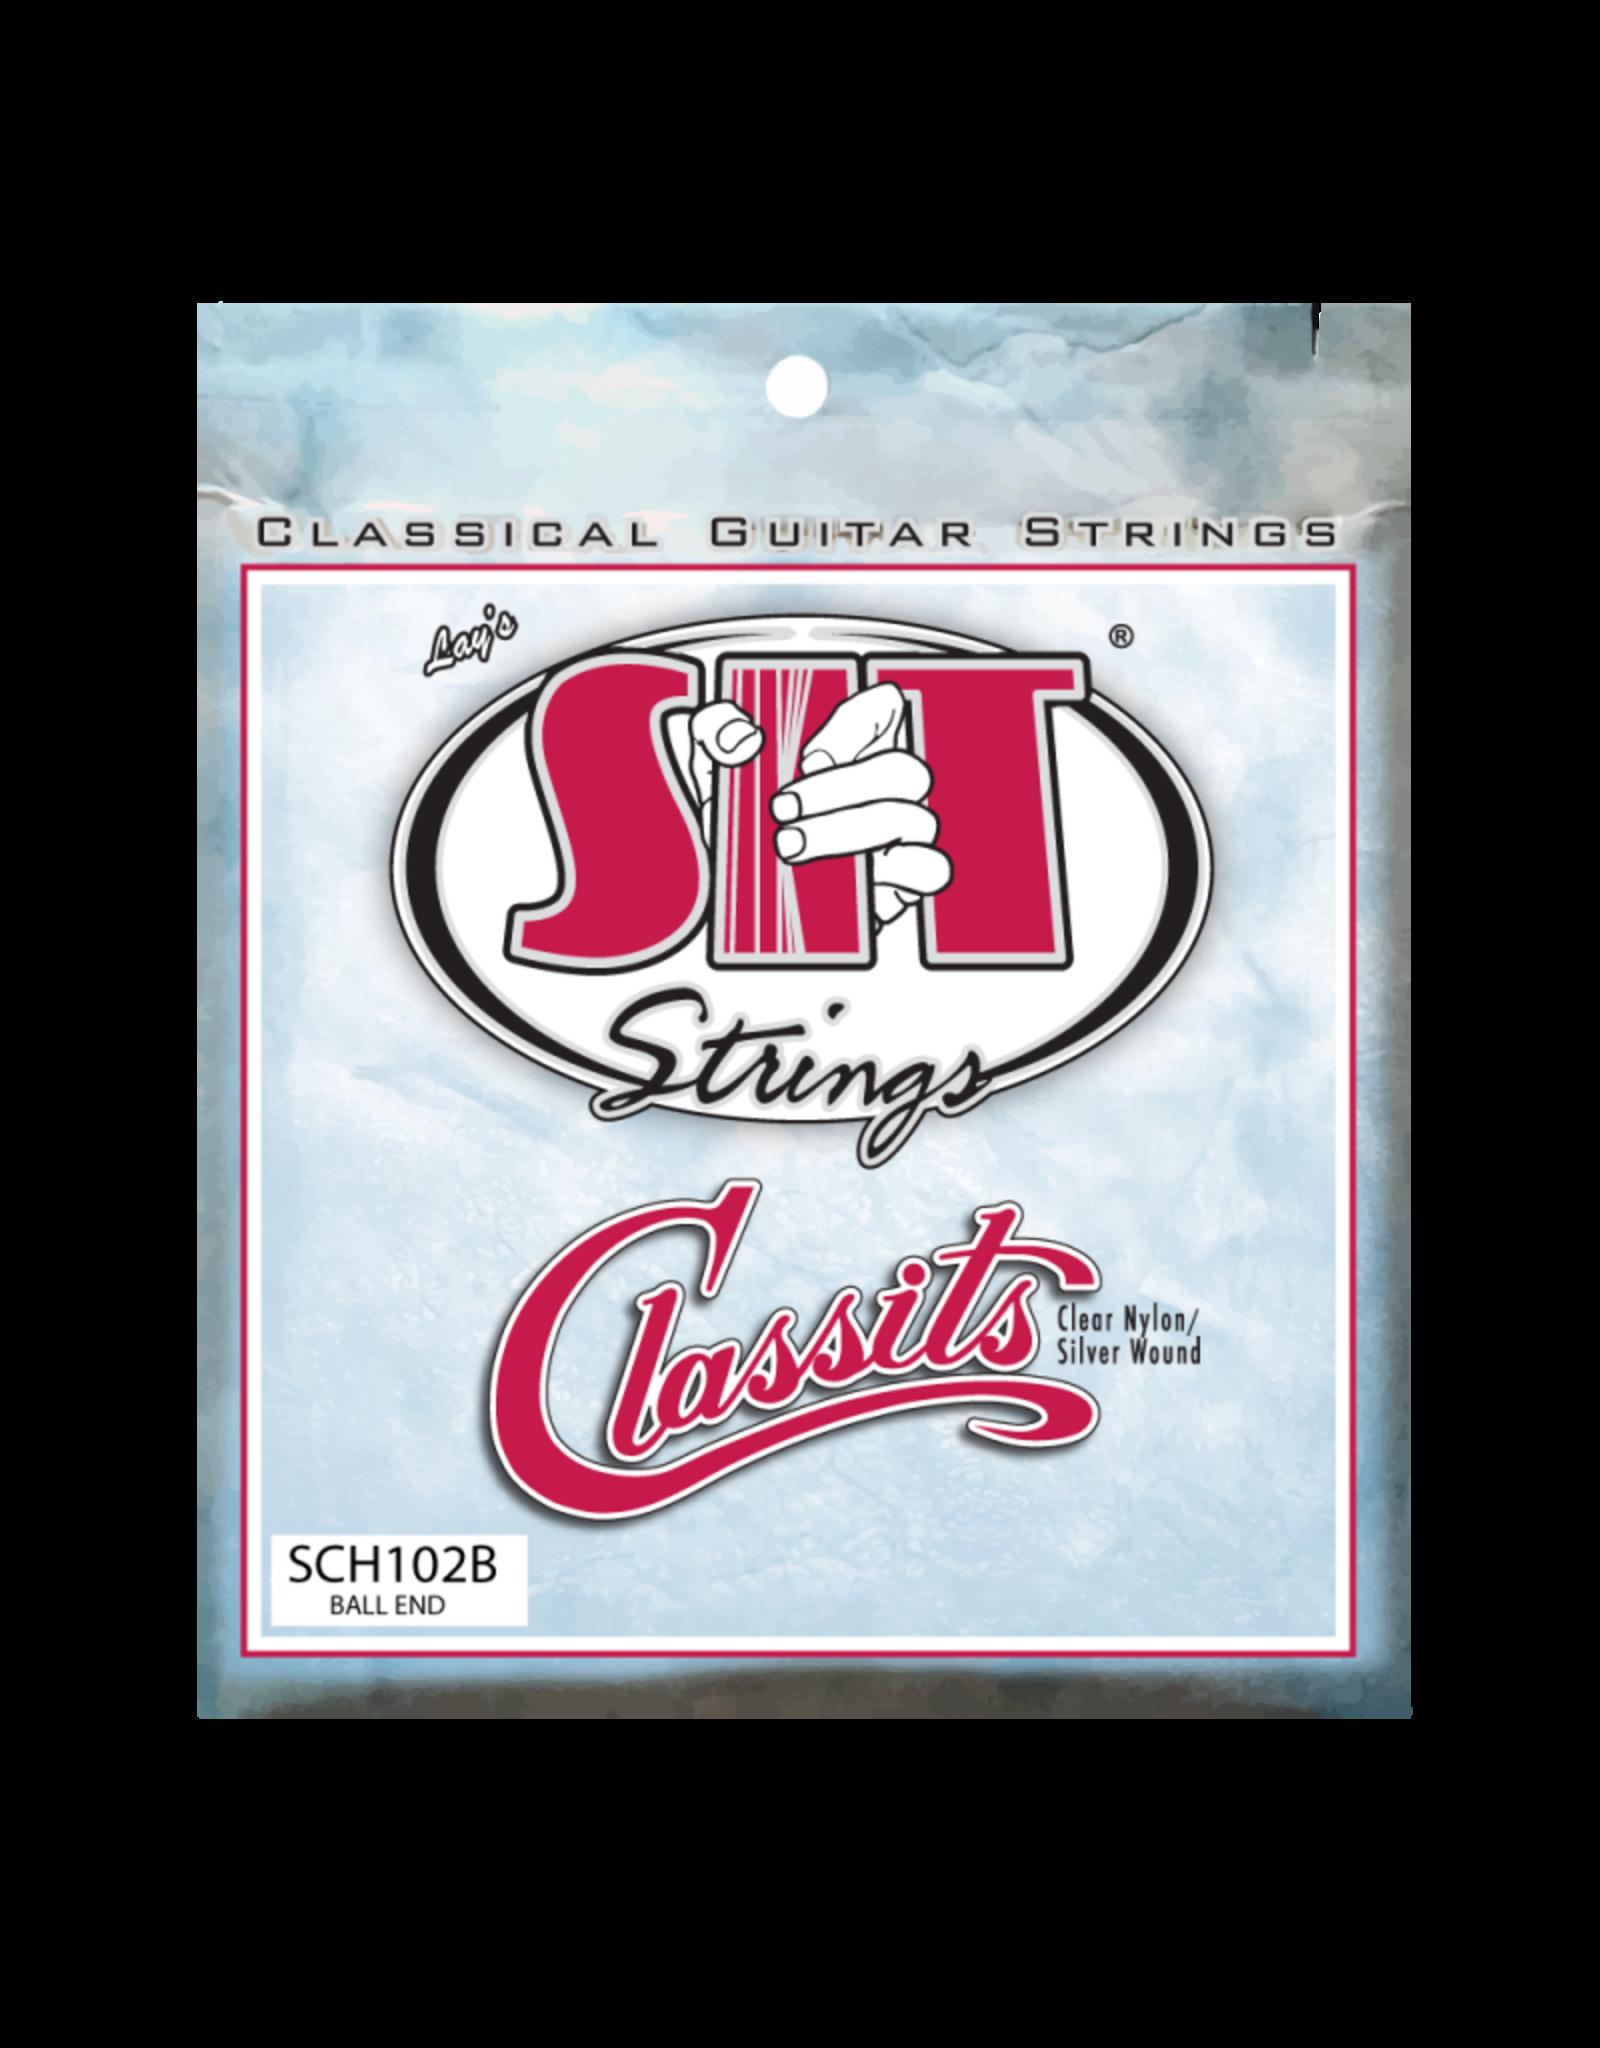 SIT Strings SIT SCH102B High Tension Folk Classits Clear Nylon & Silver Wound Ball End